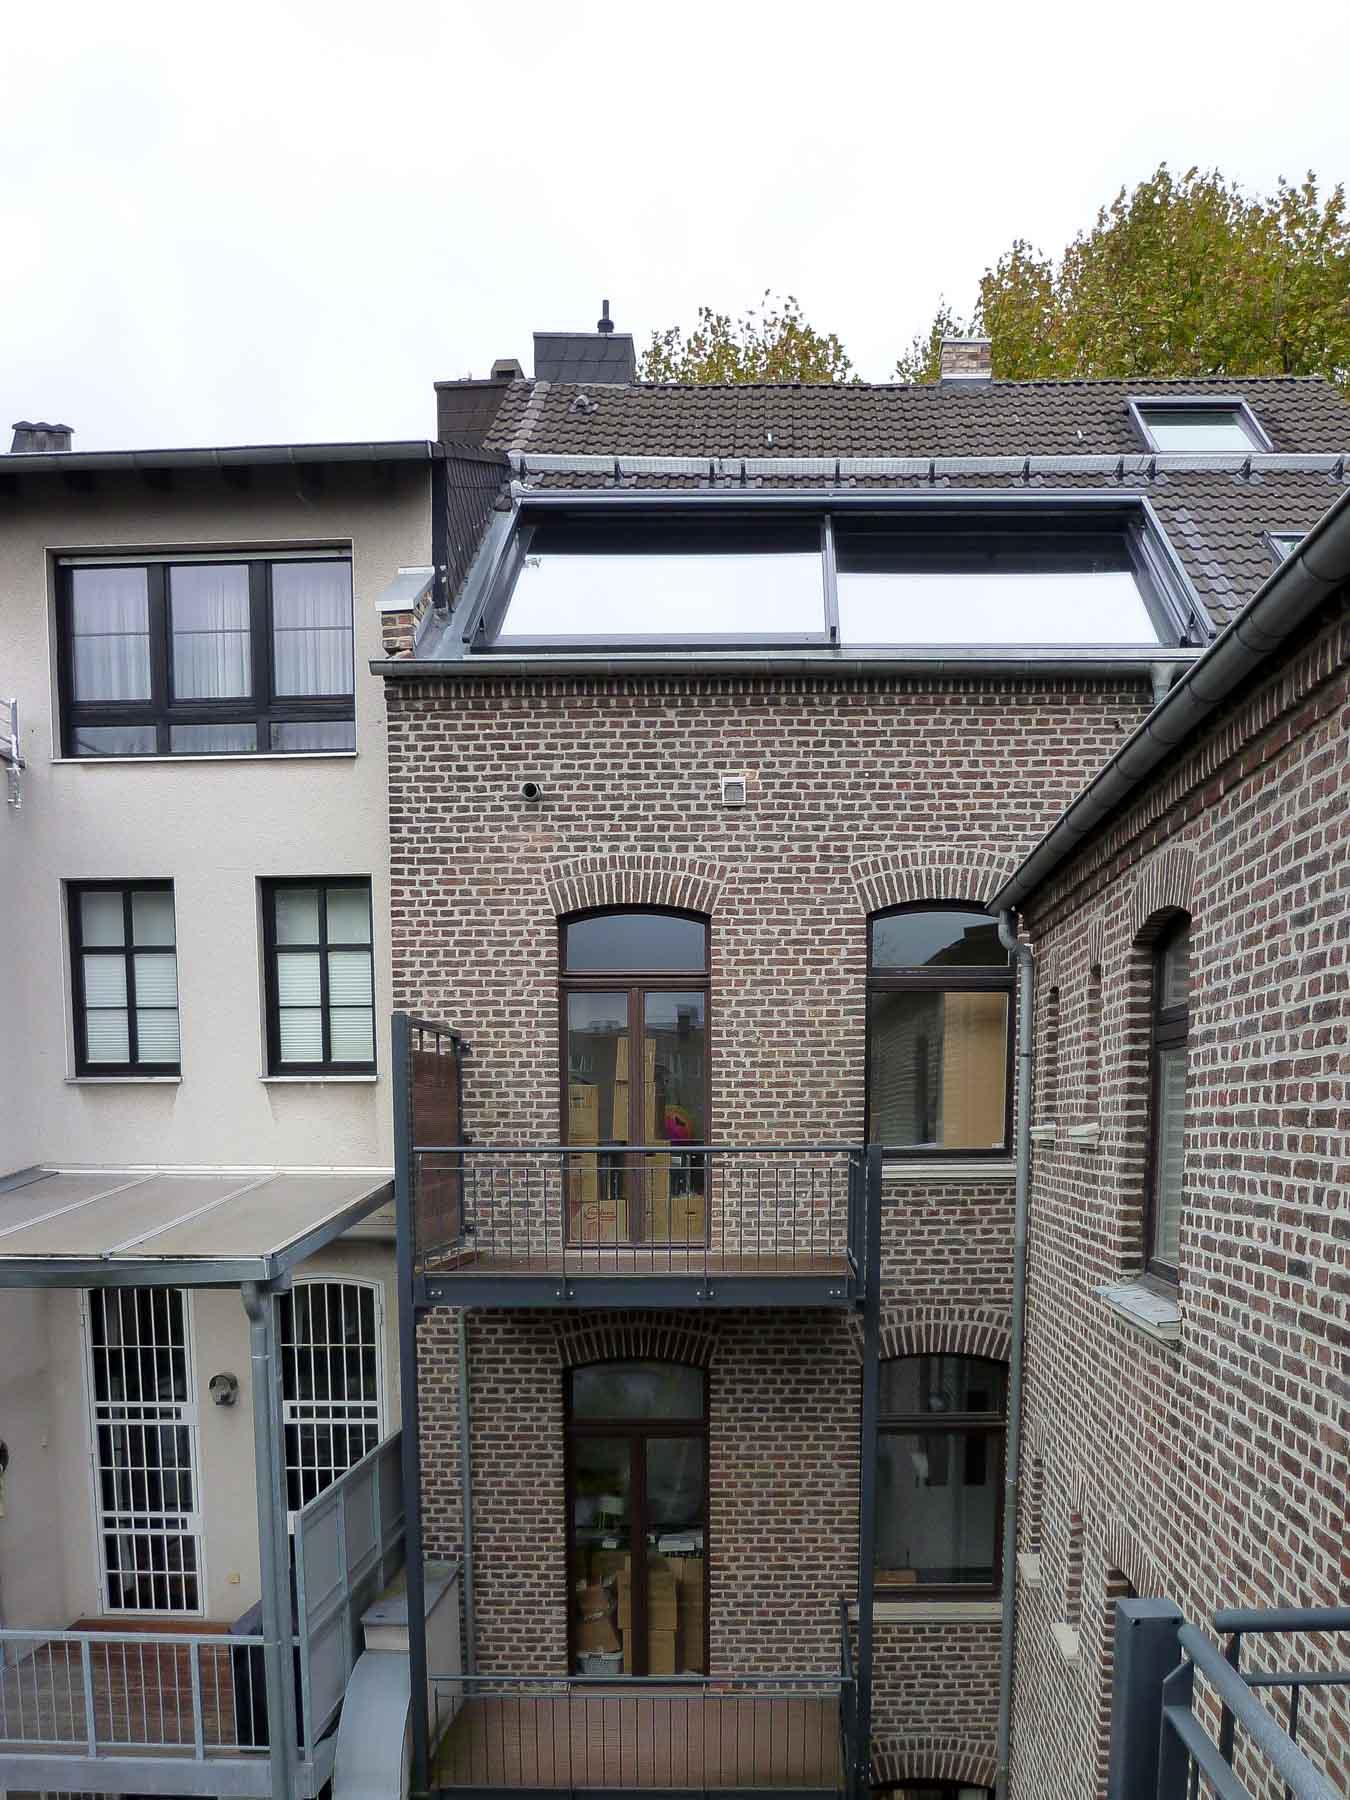 Panorama Dachschiebefenster in Neuss (Objekt 1170). 2-teiliges Dachschiebefenster (Panorama AL) zur Belichtung der Küche im Dachgeschoss